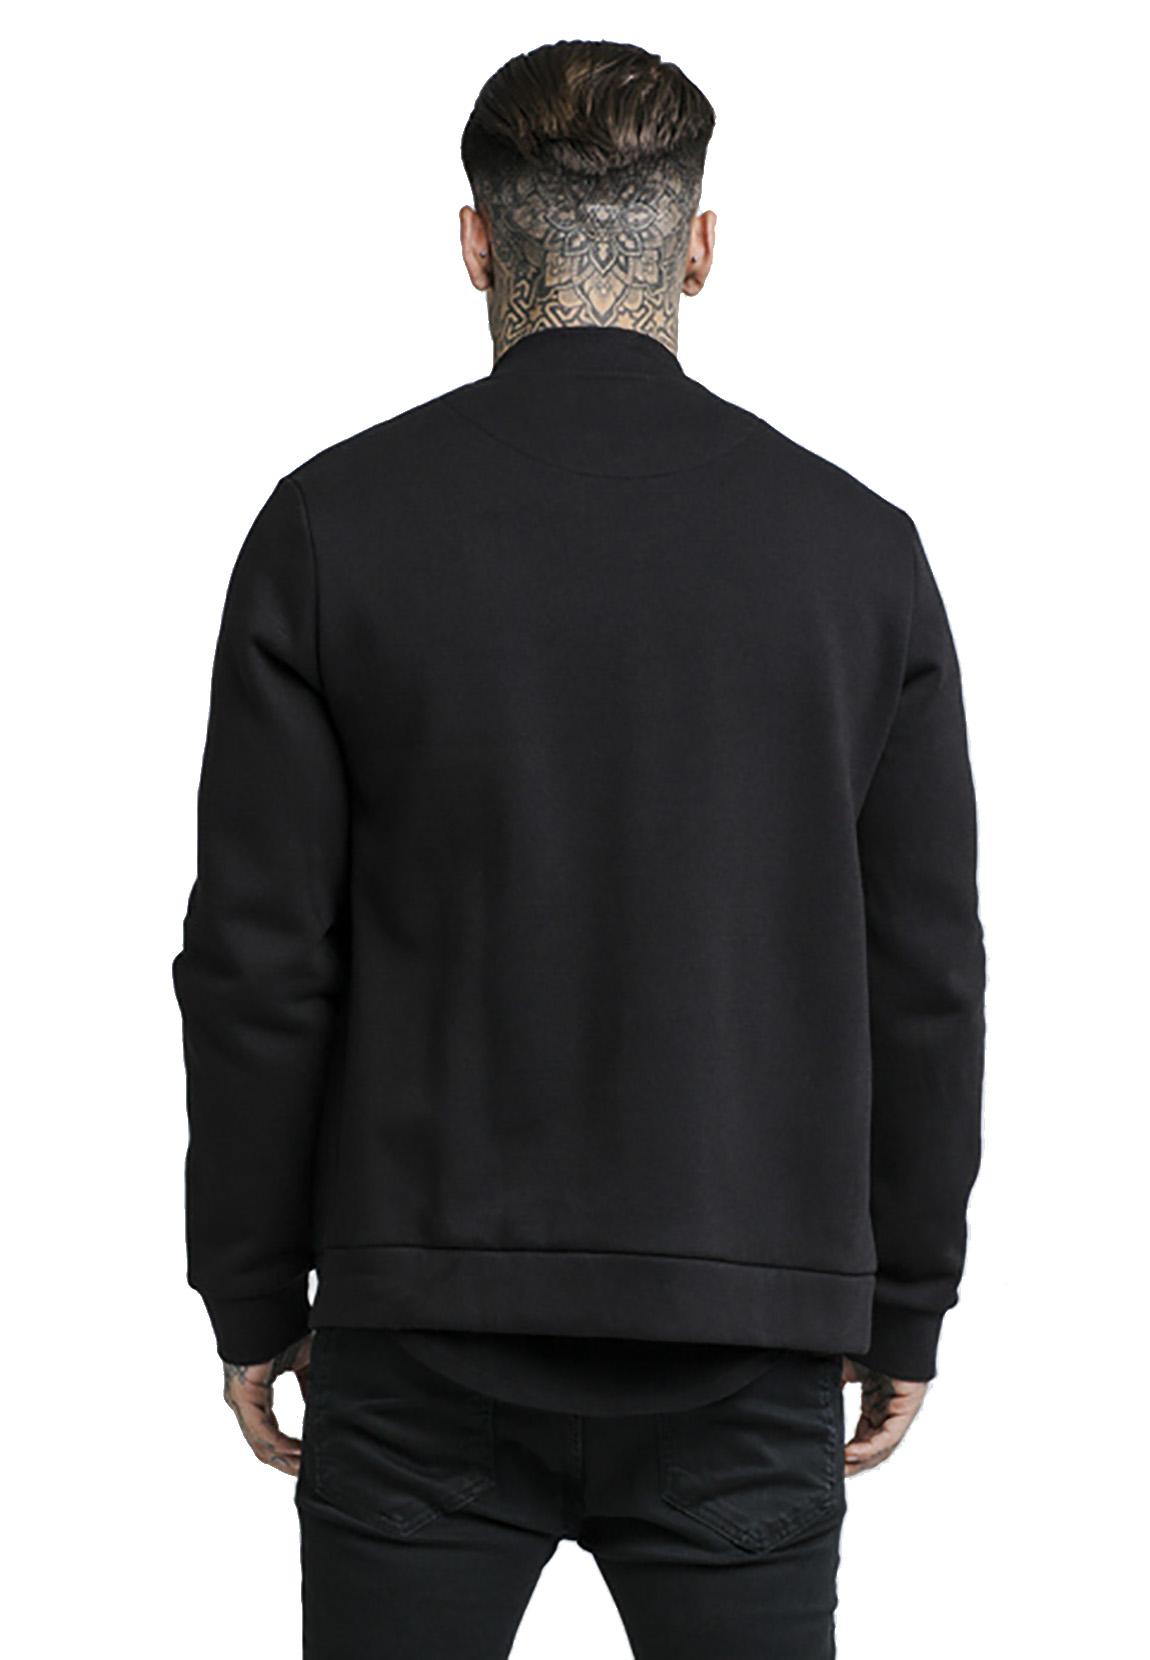 SikSilk Jacke Herren SWEATER BOMBER JACKET SS-14437 Schwarz Black